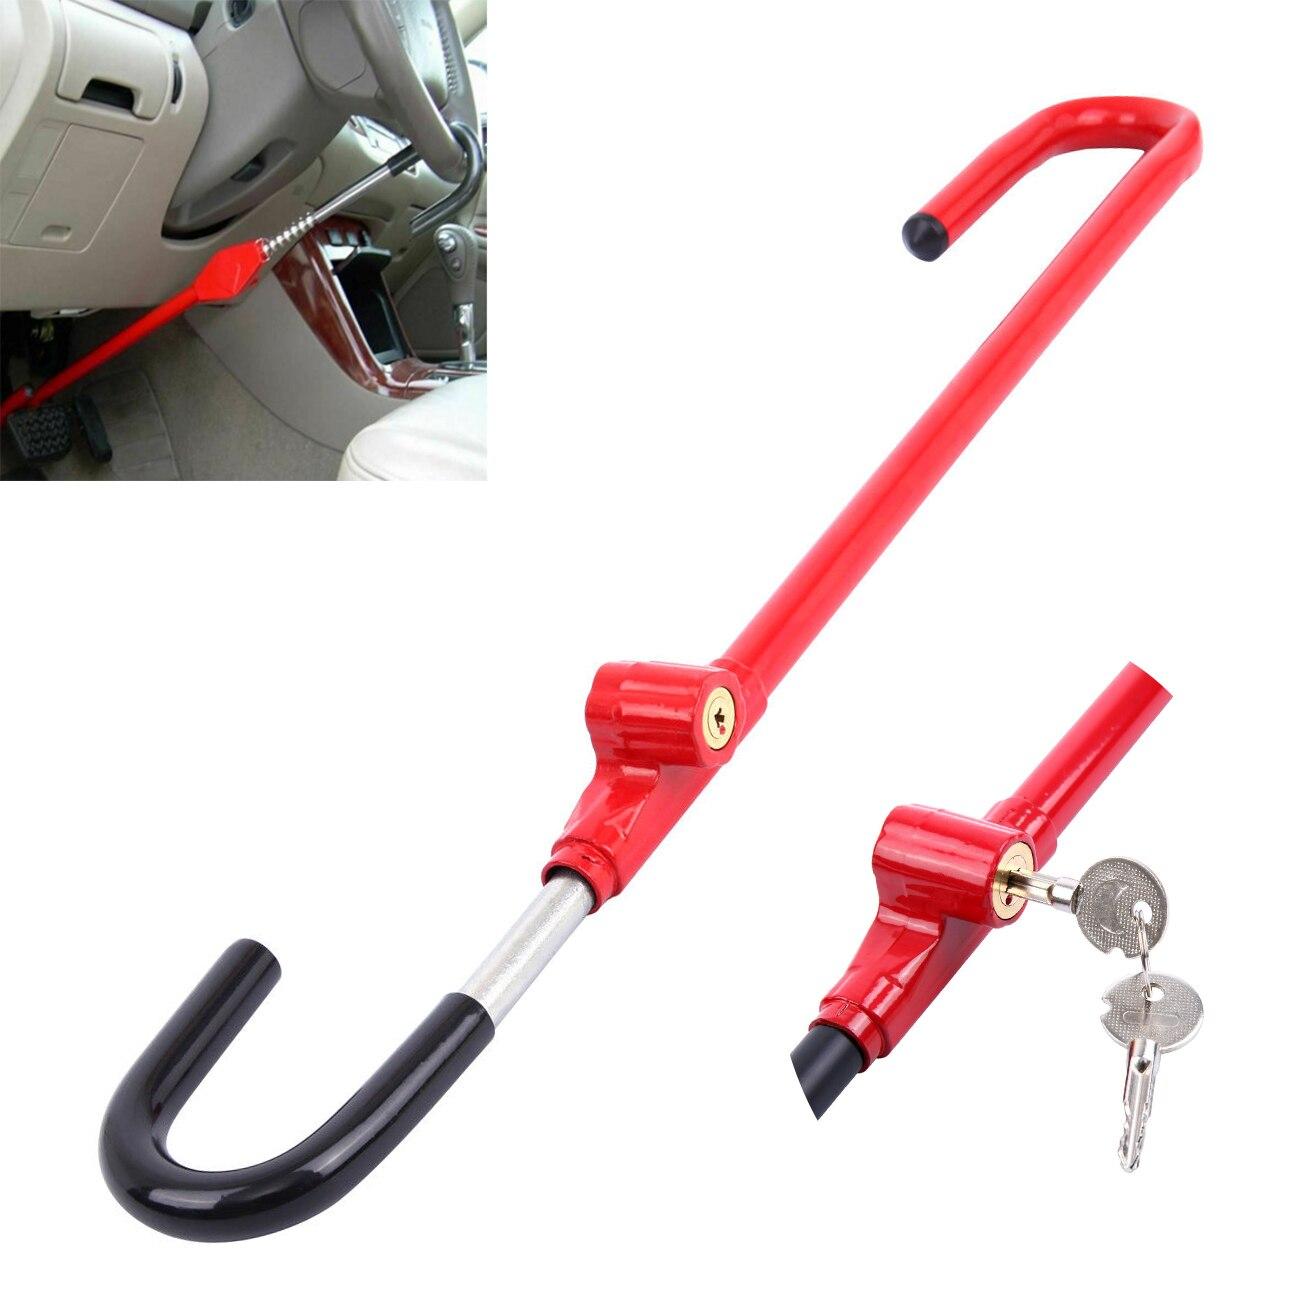 Samger Steering Wheel Locks Anti Theft Lock Universal Car Pedal Lock Anti Theft Steering Wheel Security System Auto Accessories